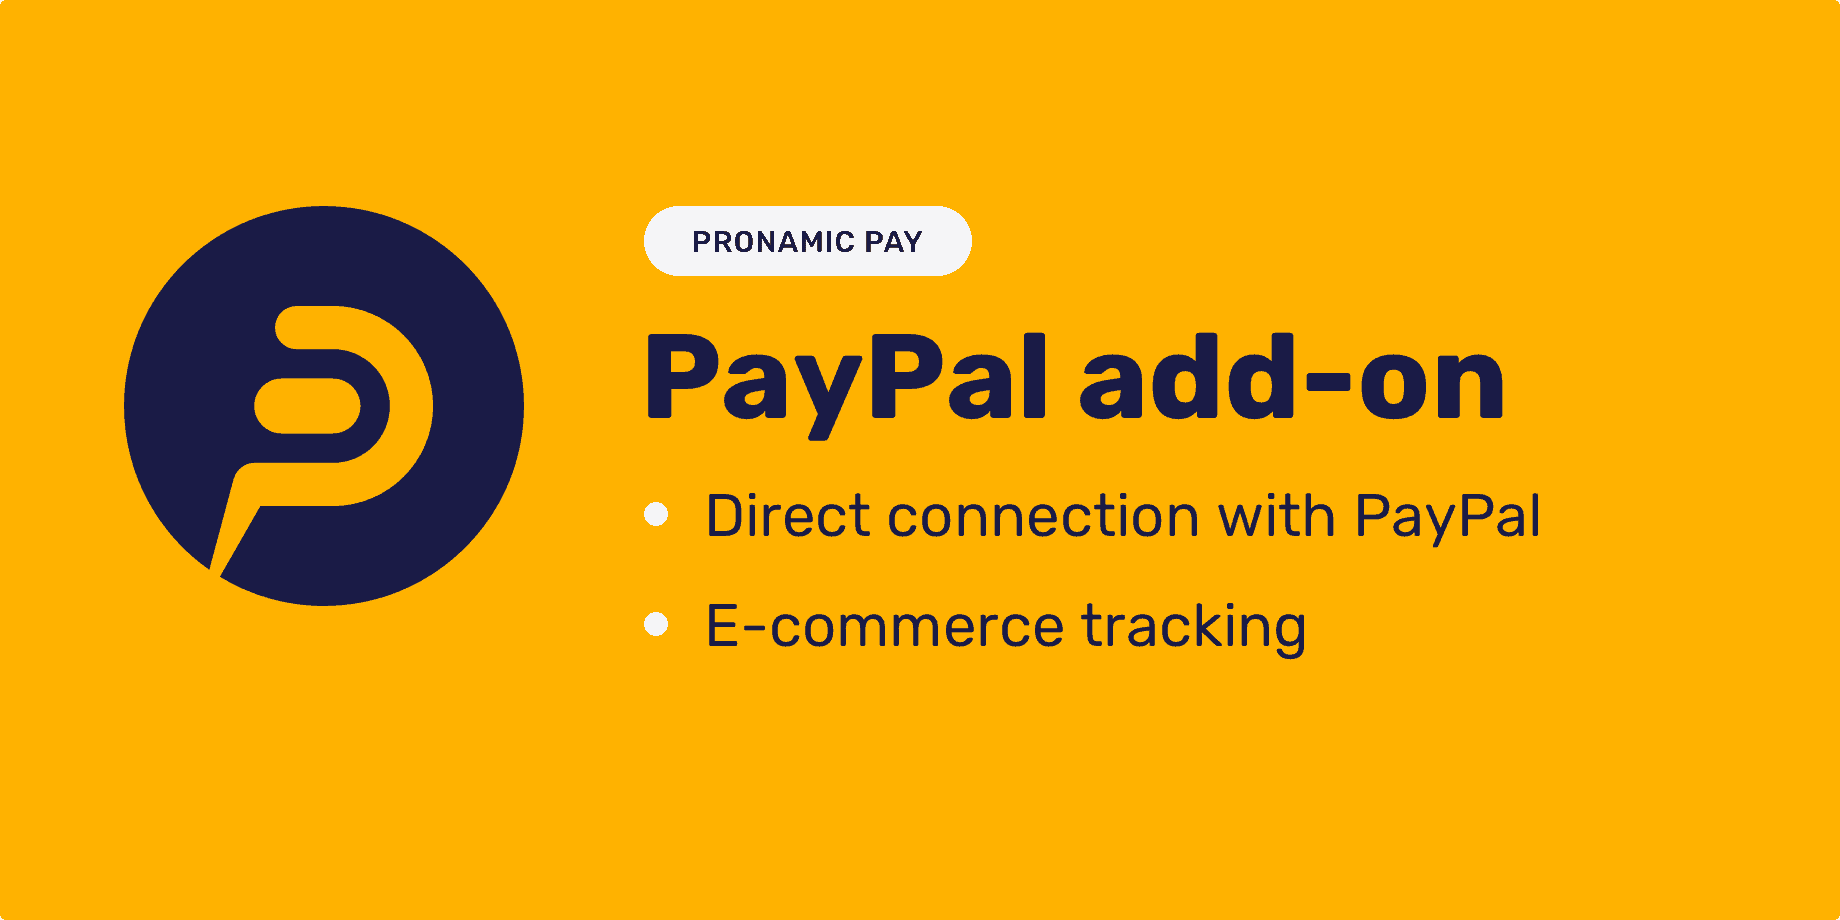 Pronamic Pay PayPal Add-on